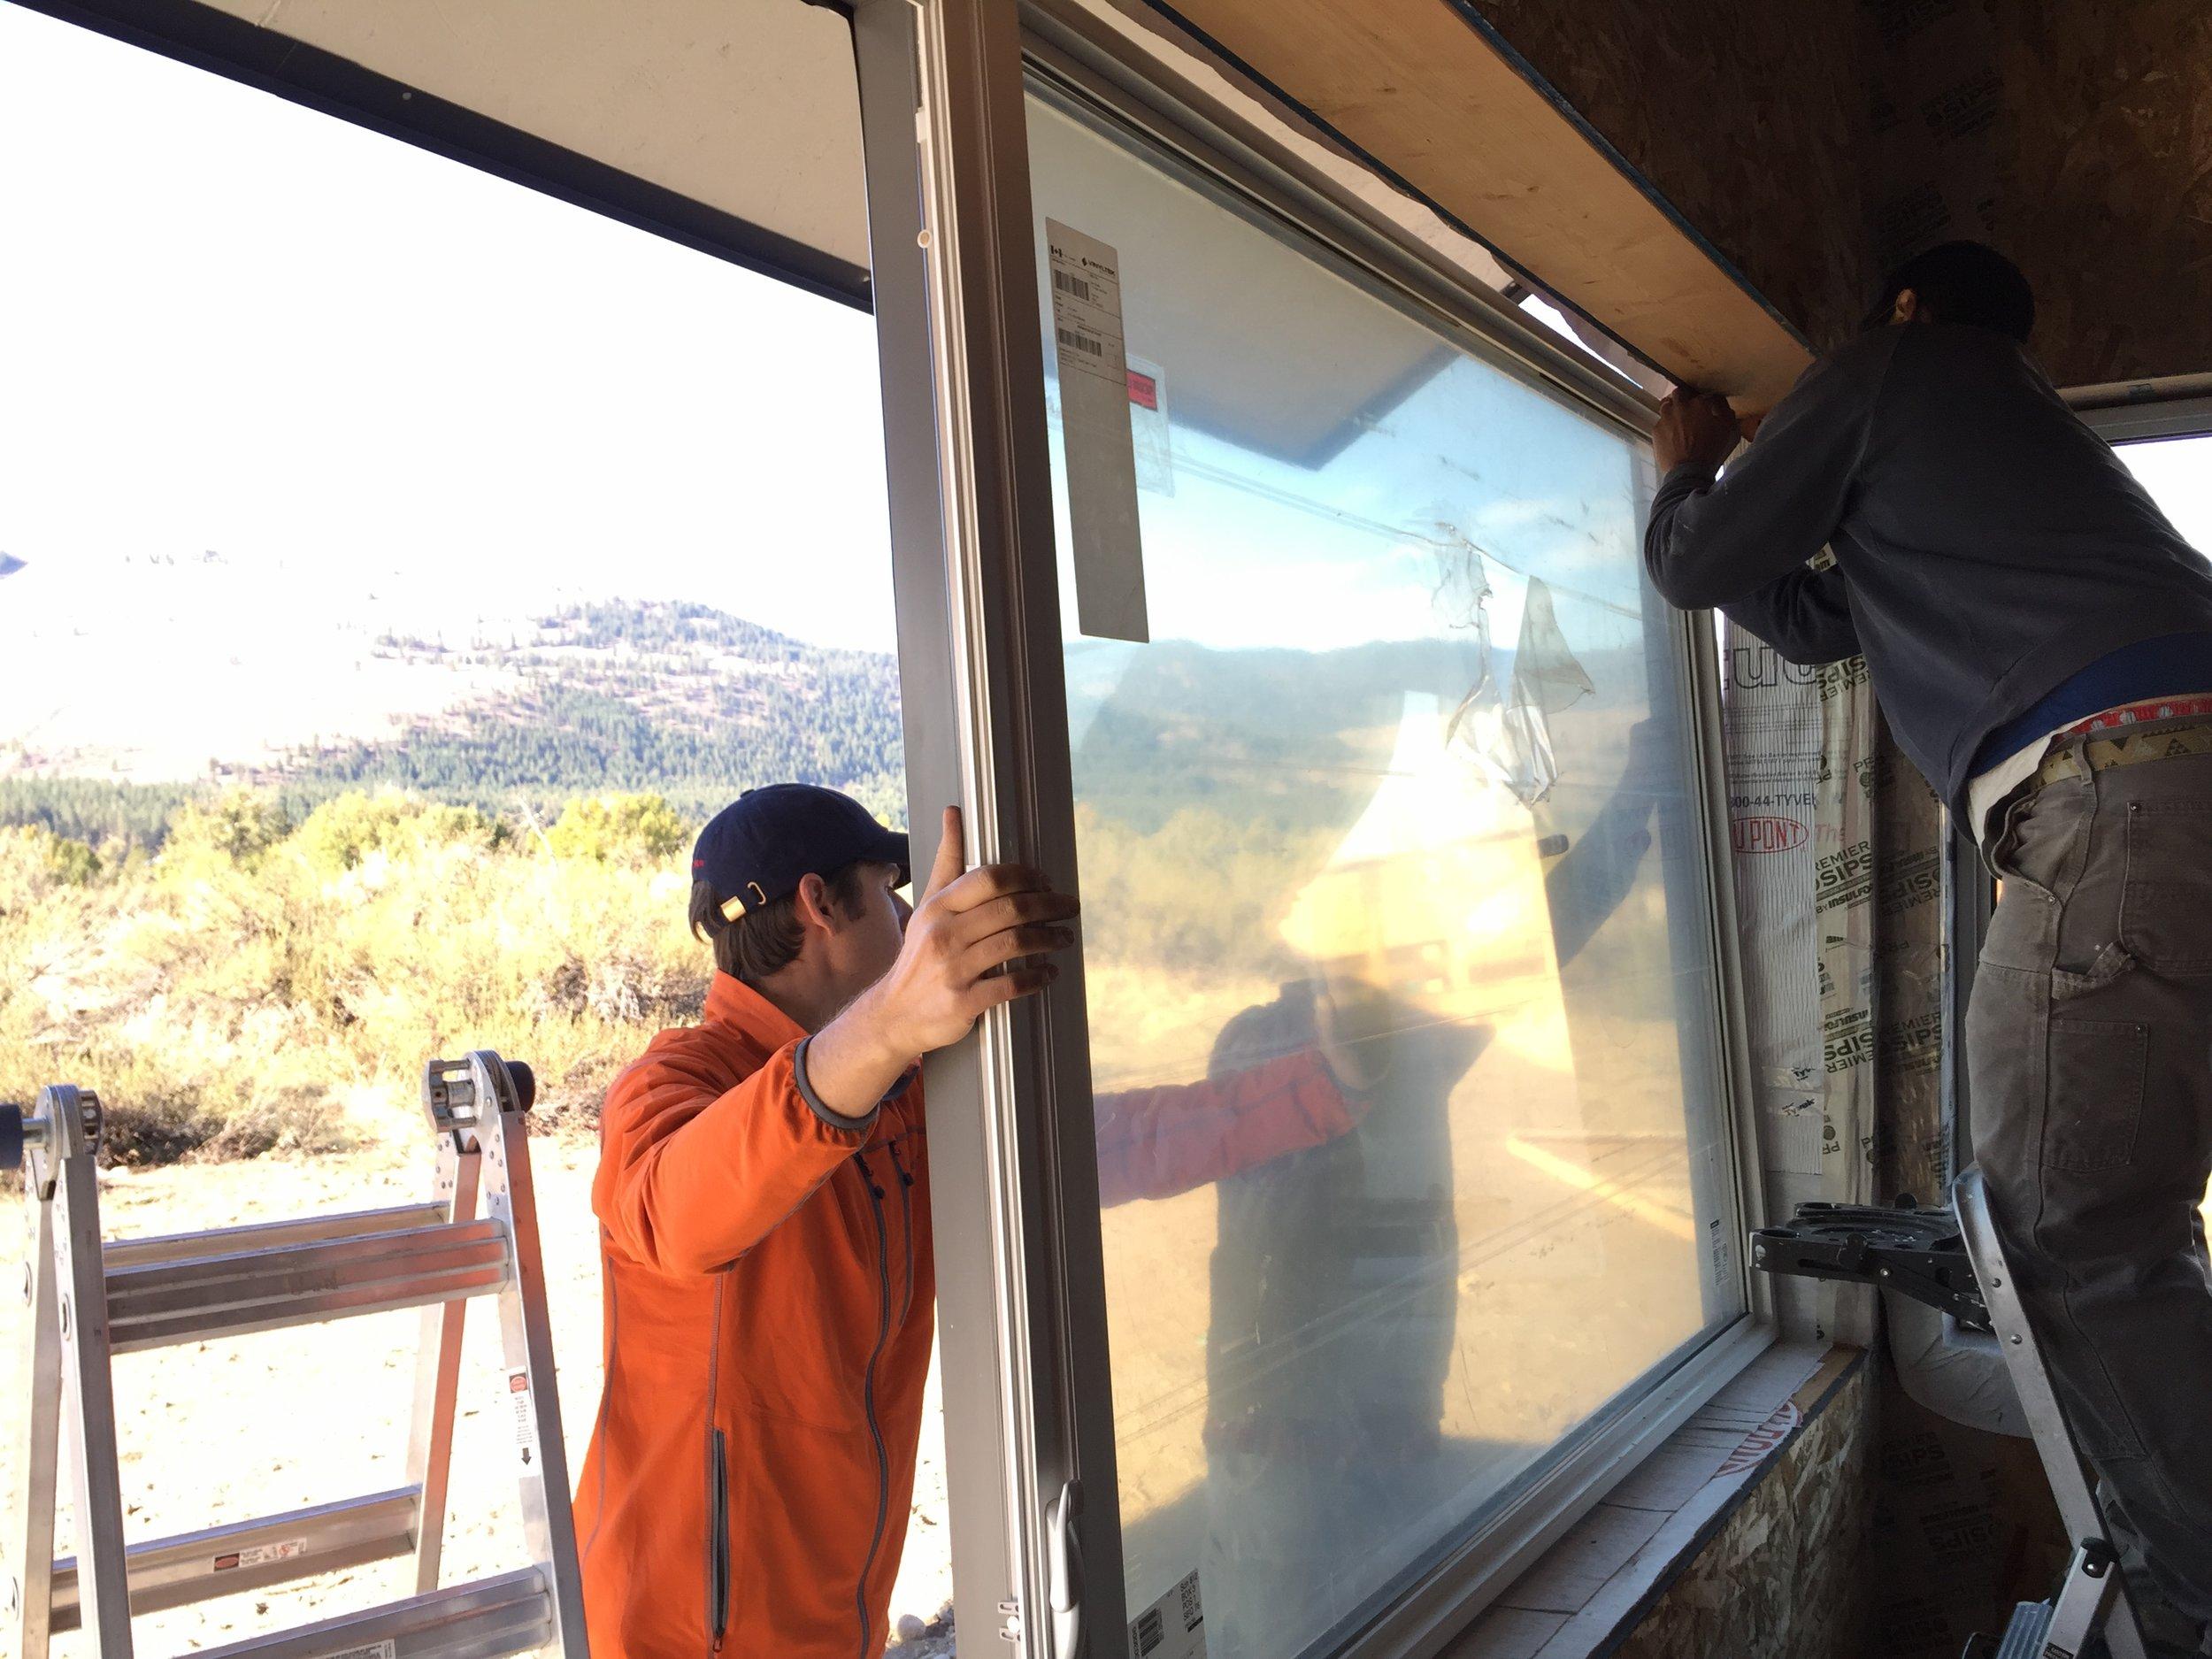 Installing the final window after a long saga!